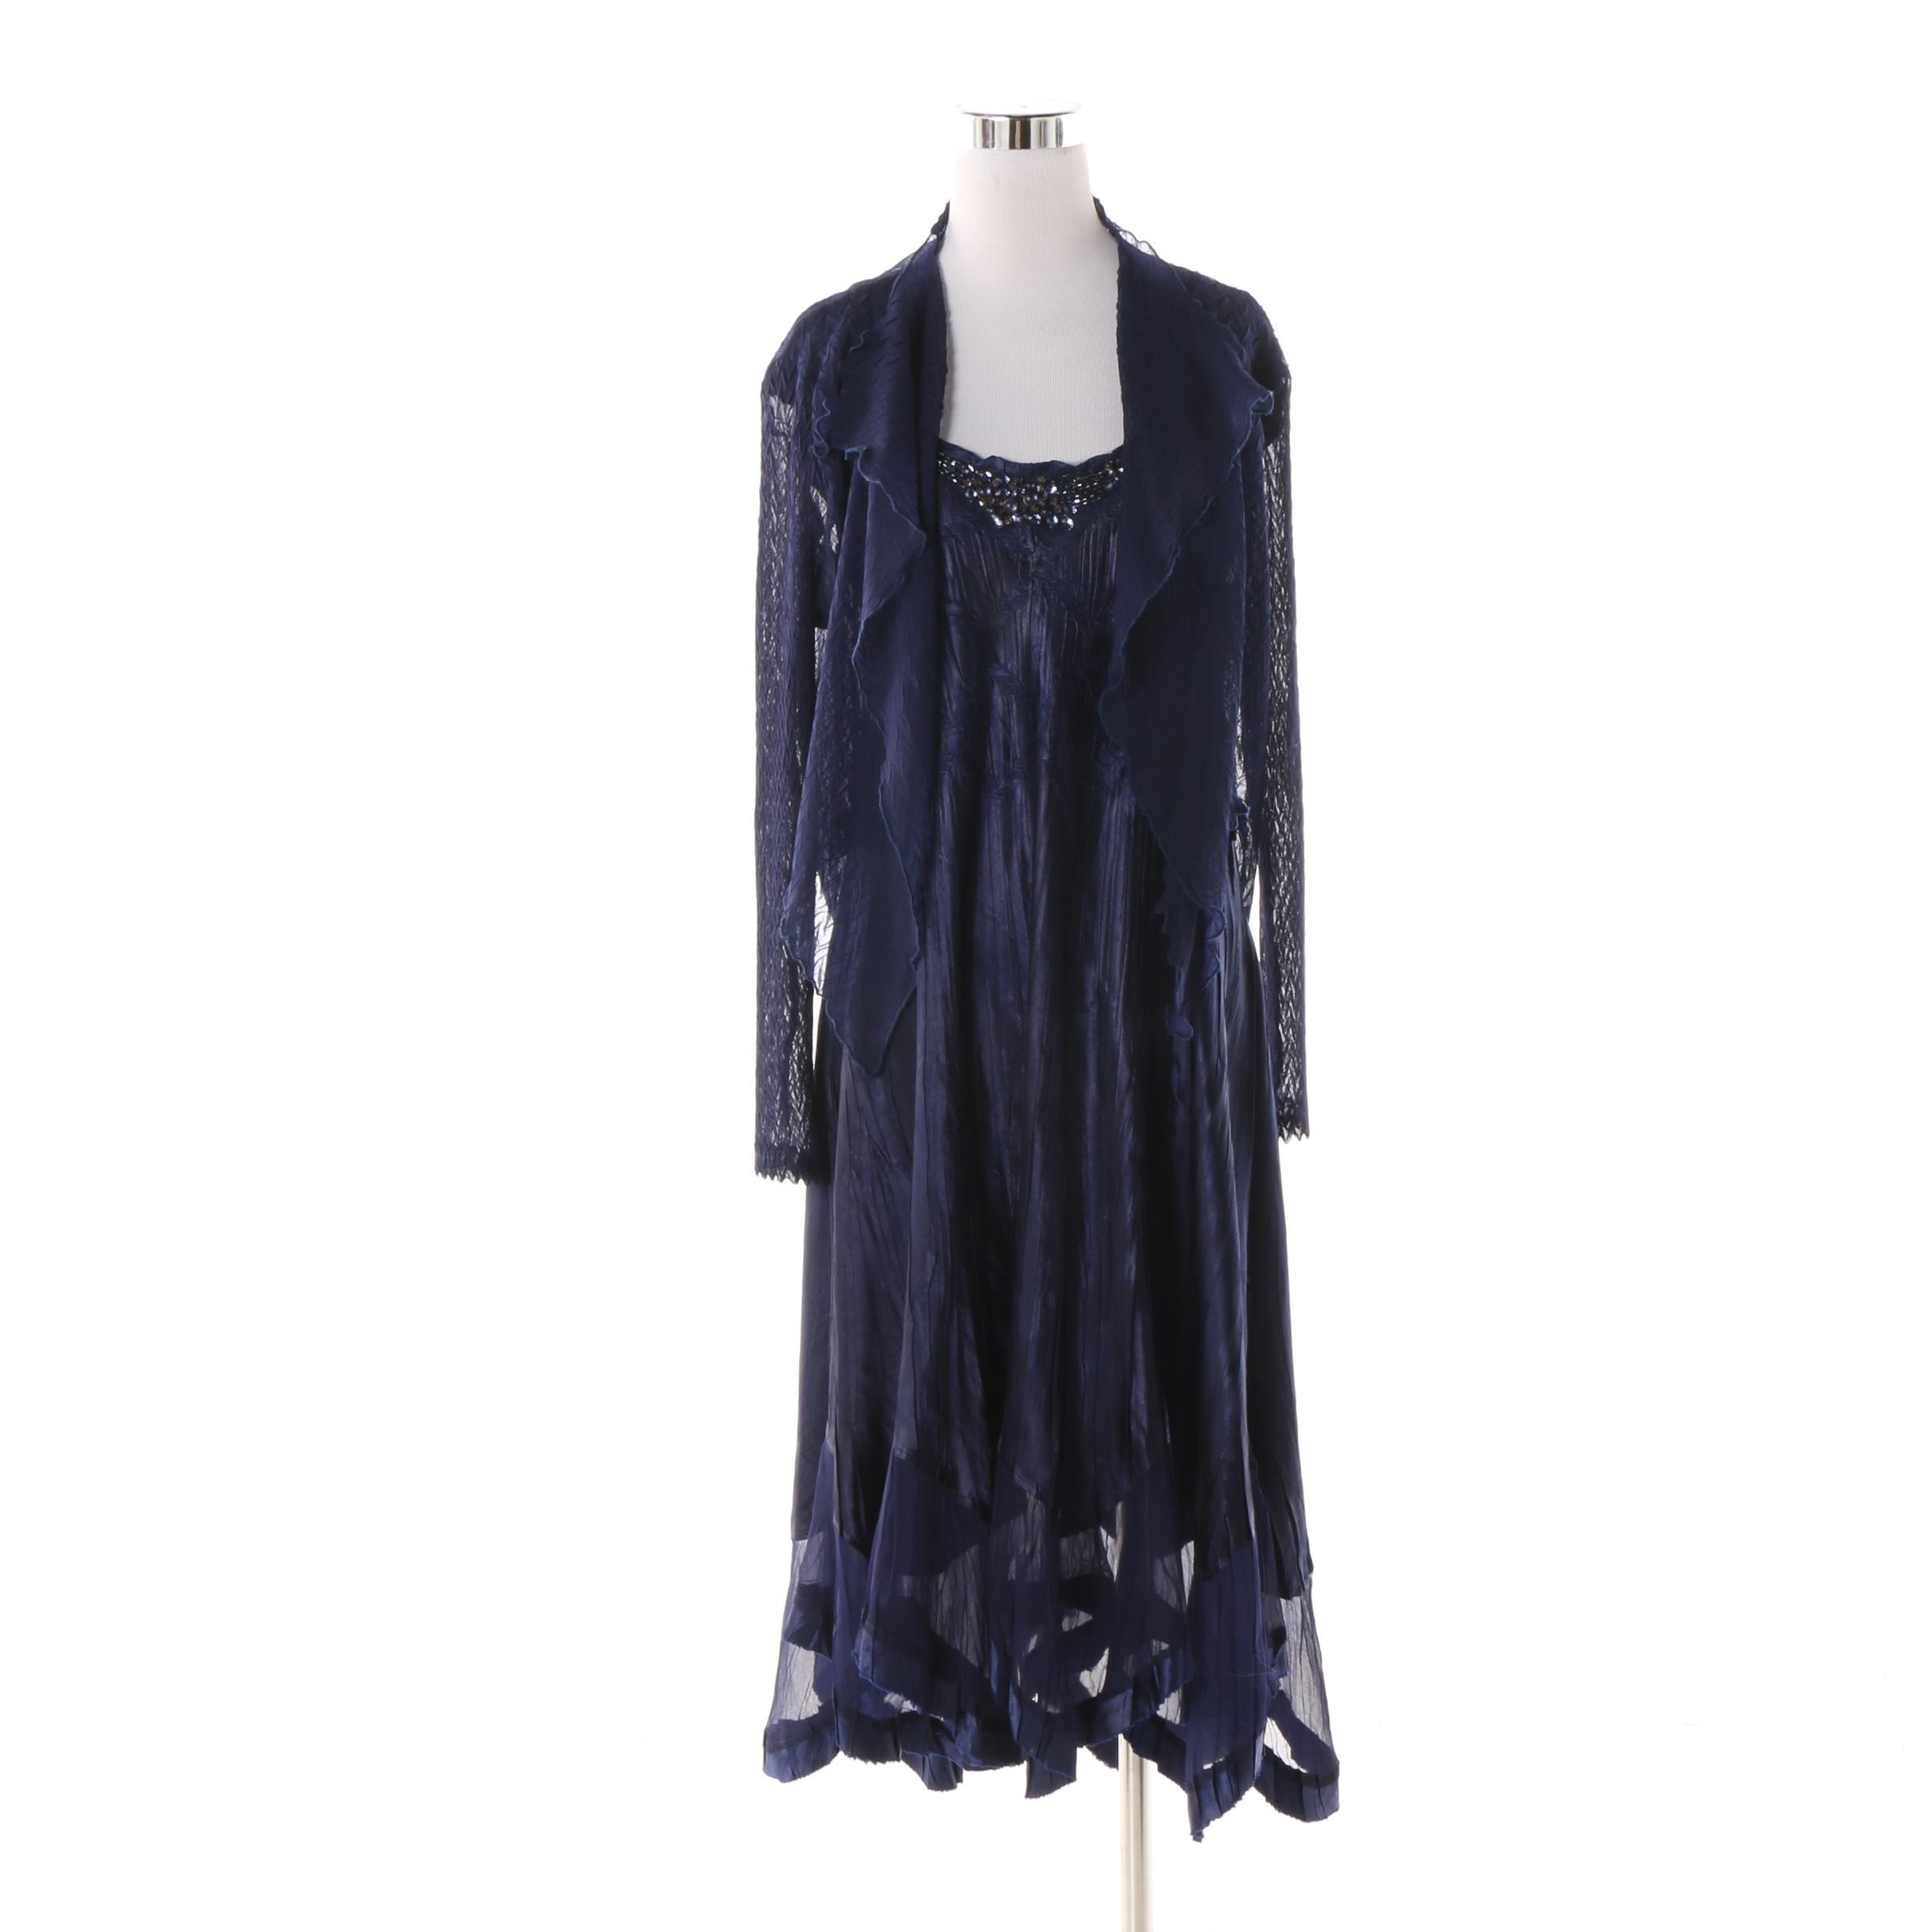 Komarov Blue Dress with Matching Shrug featuring Sheer Handkerchief Hem